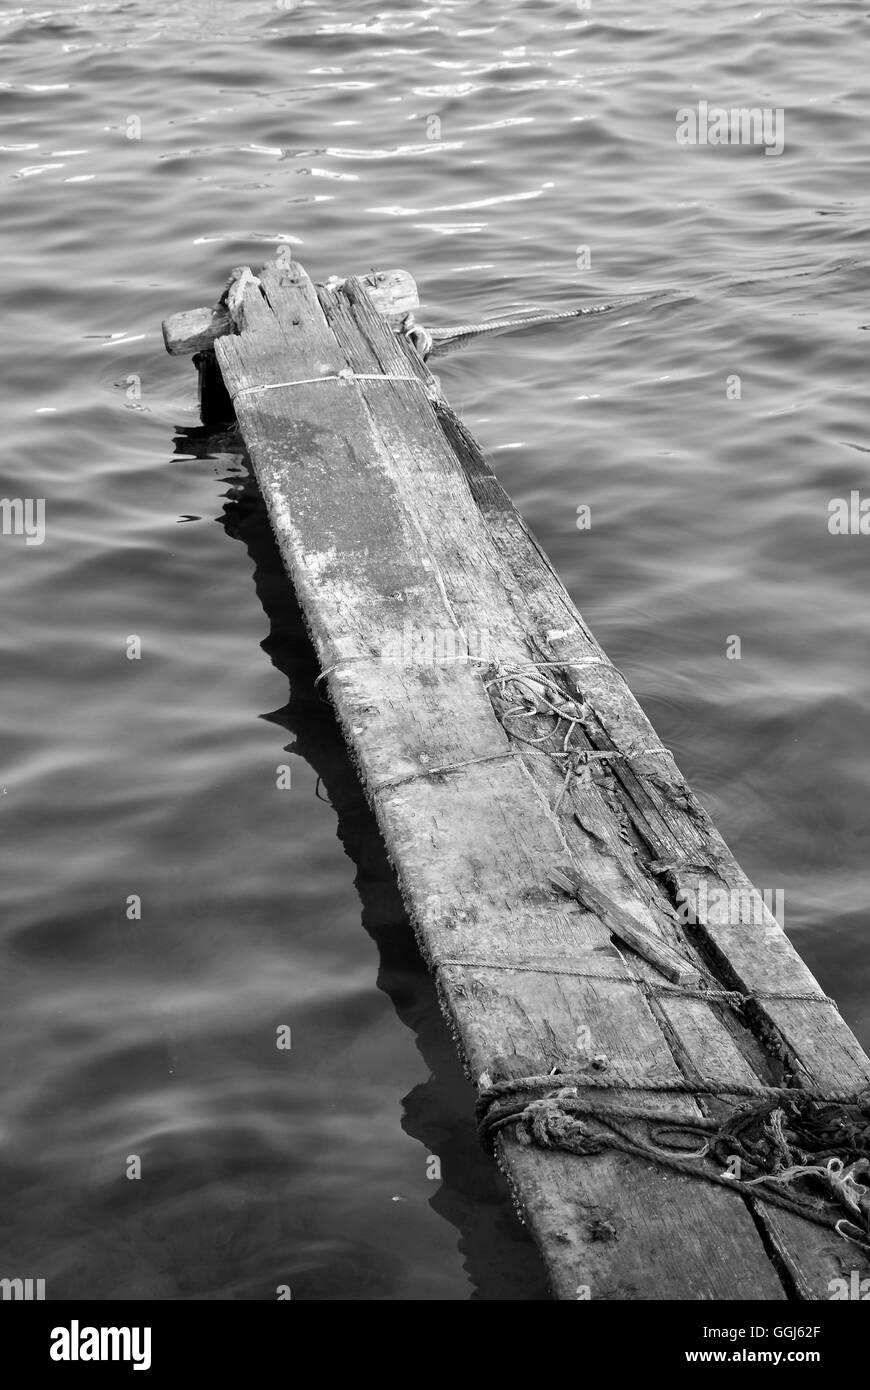 floating log ocean sea marine life wood wooden afloat shore water - Stock Image